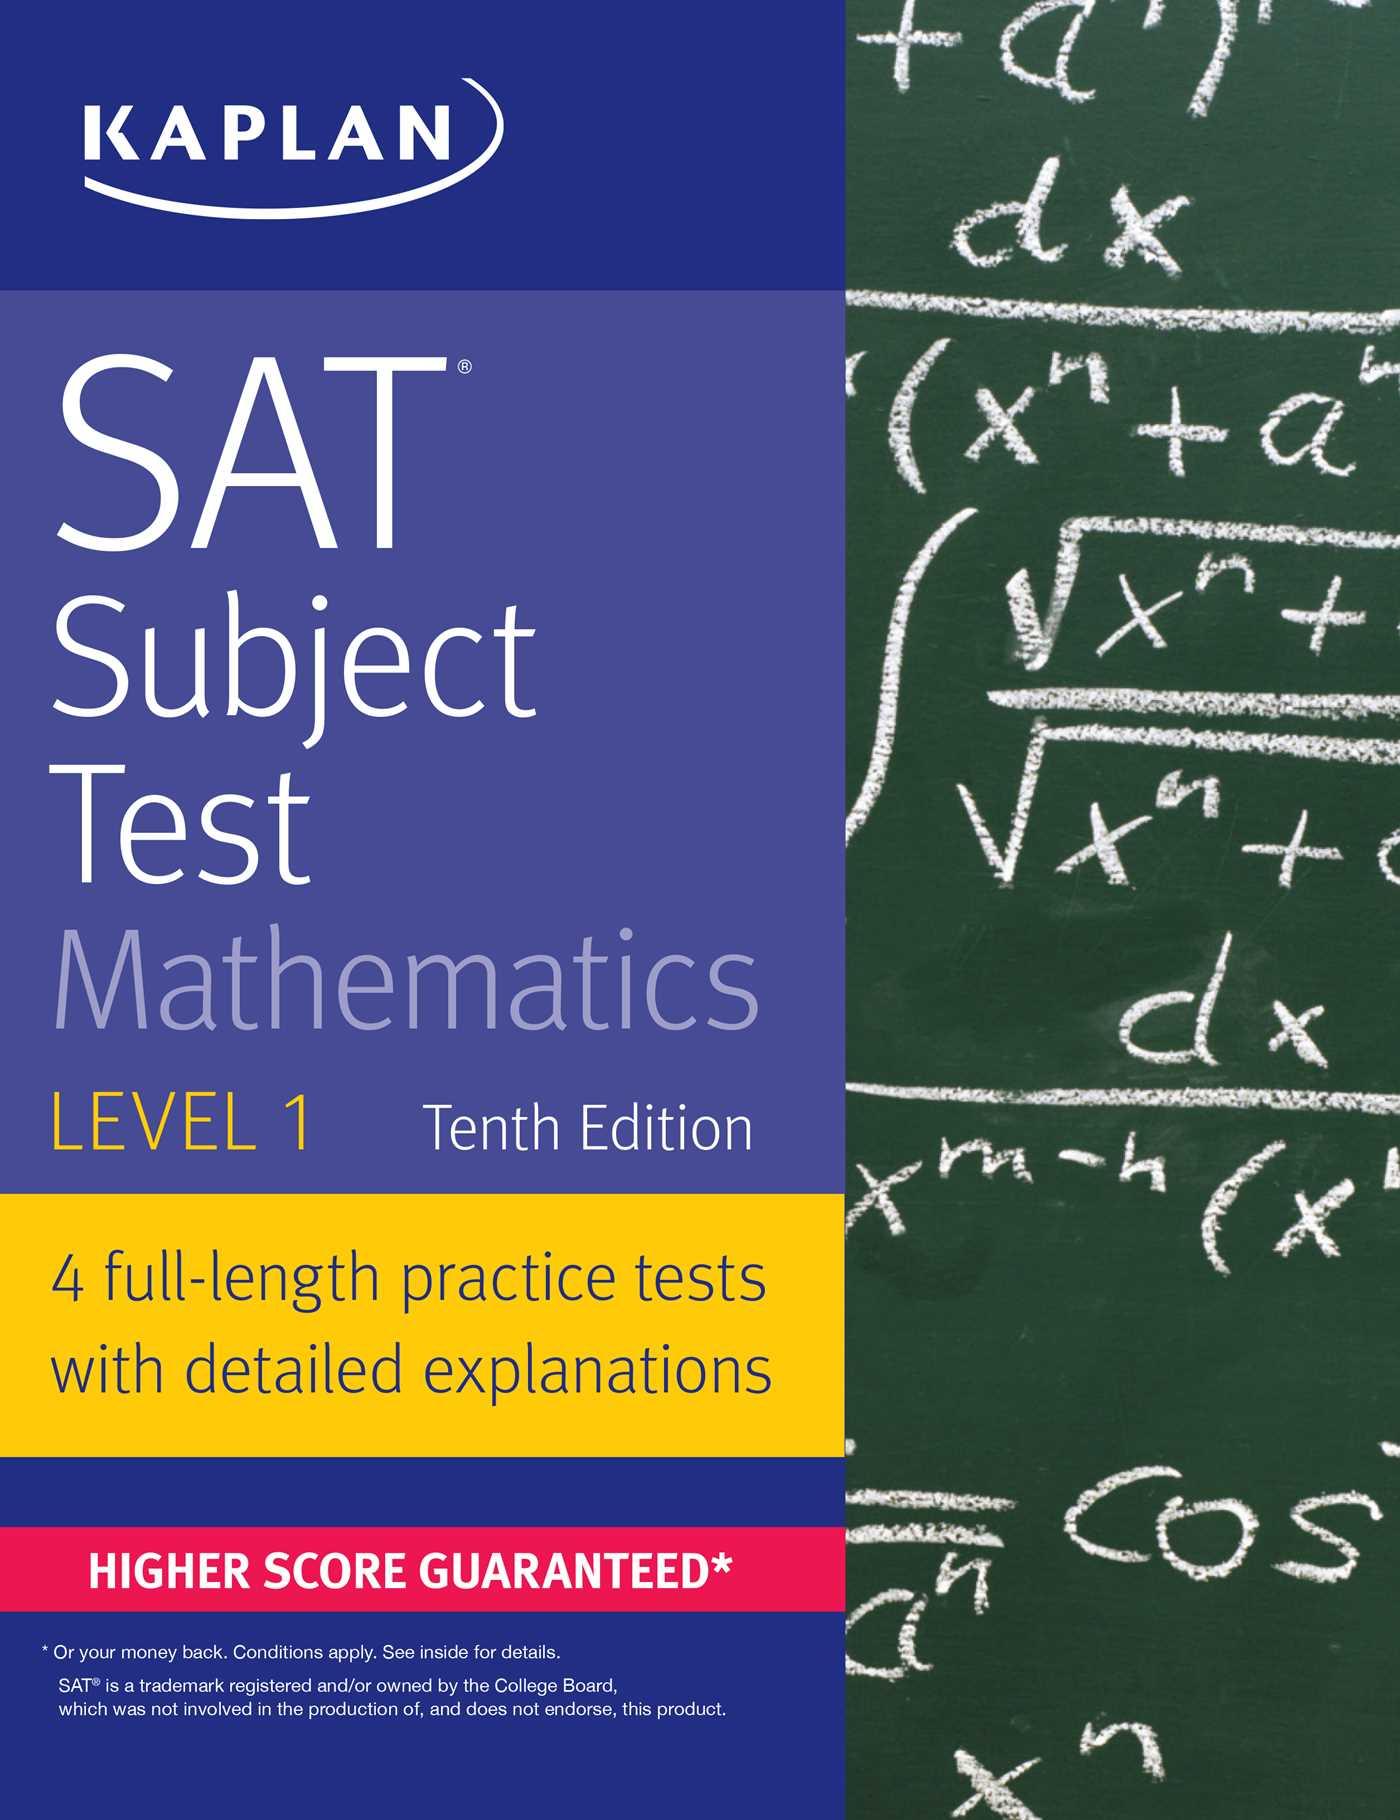 Worksheets Sat Math Prep Worksheets sat subject test mathematics level 1 book by kaplan prep 9781506209227 hr